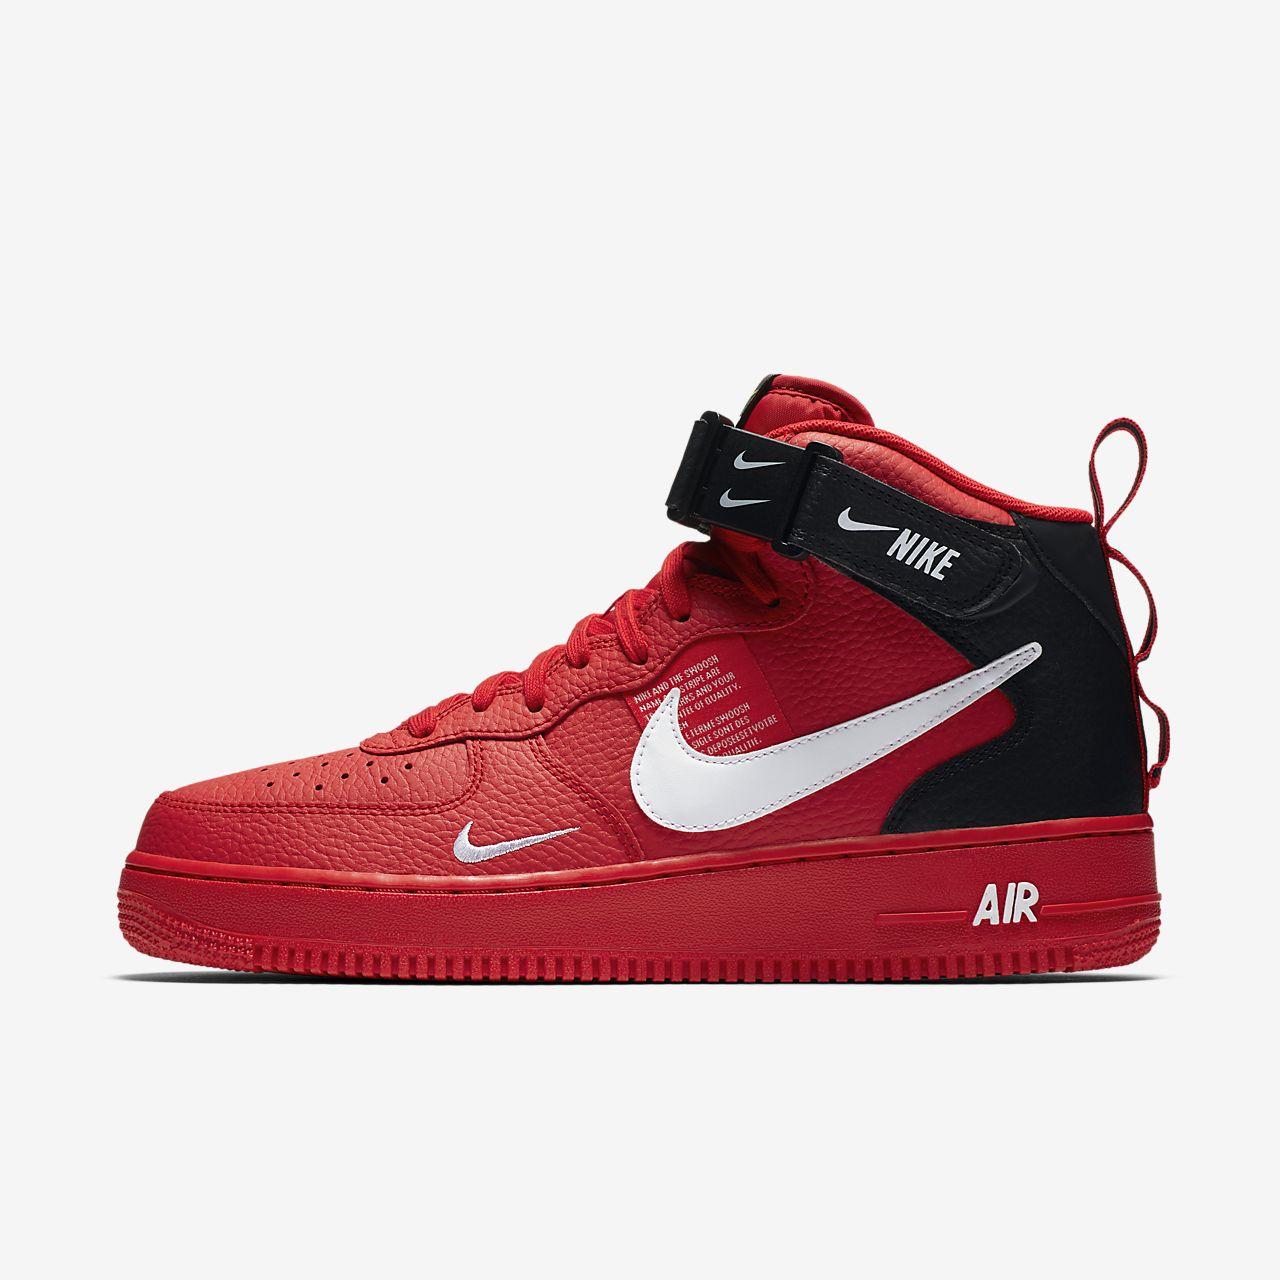 a1a7afece9d1 Мужские кроссовки Nike Air Force 1 07 Mid LV8. Nike.com RU